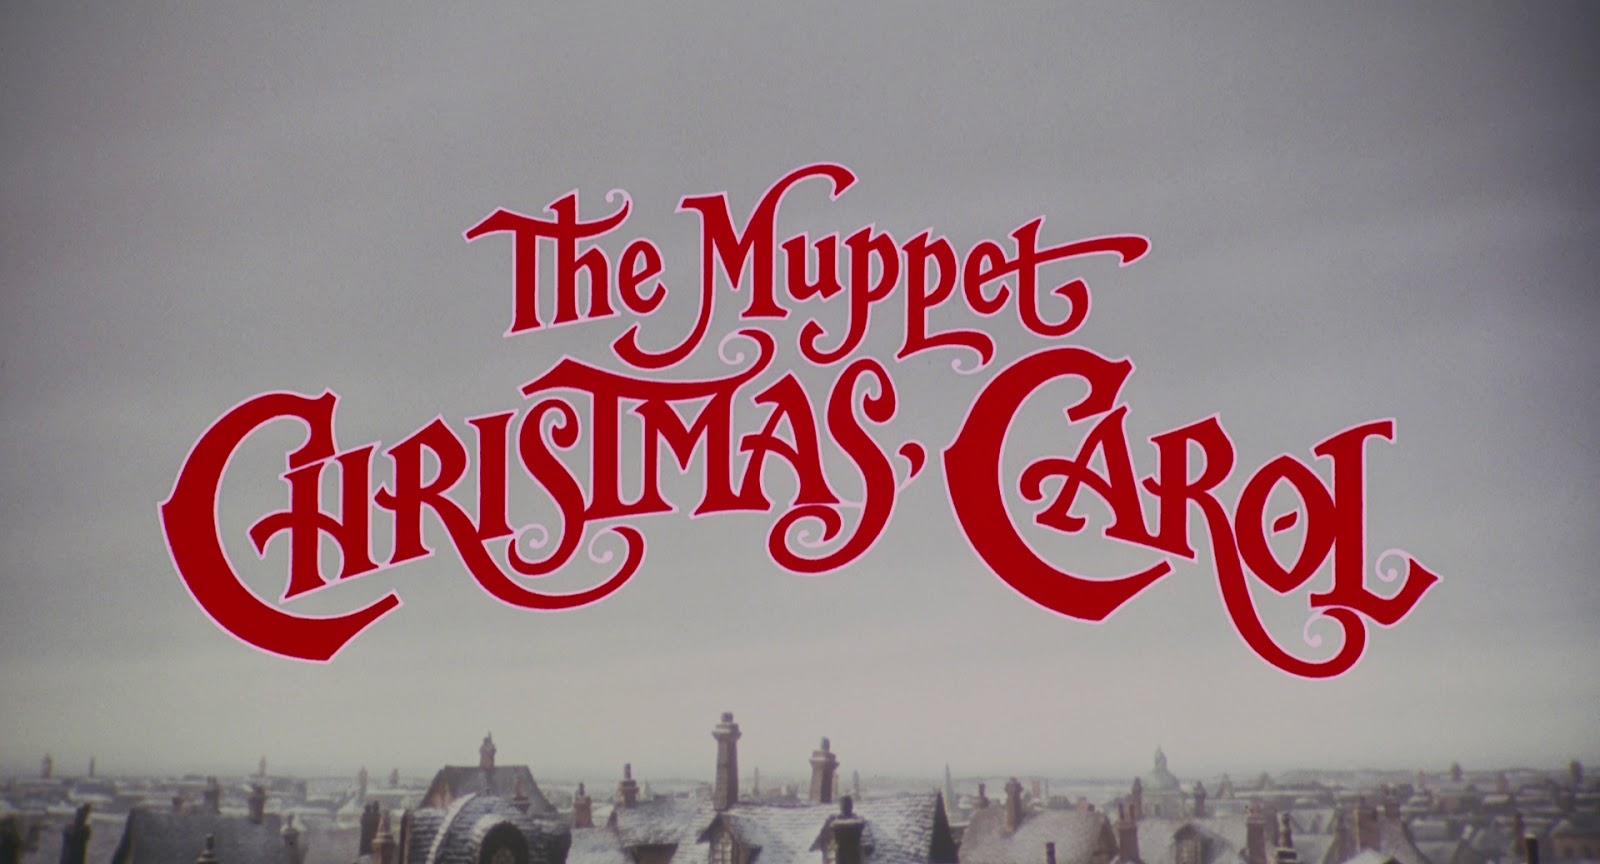 The Muppet Christmas Carol Trailer 1992.J And J Productions The Muppet Christmas Carol 1992 Review